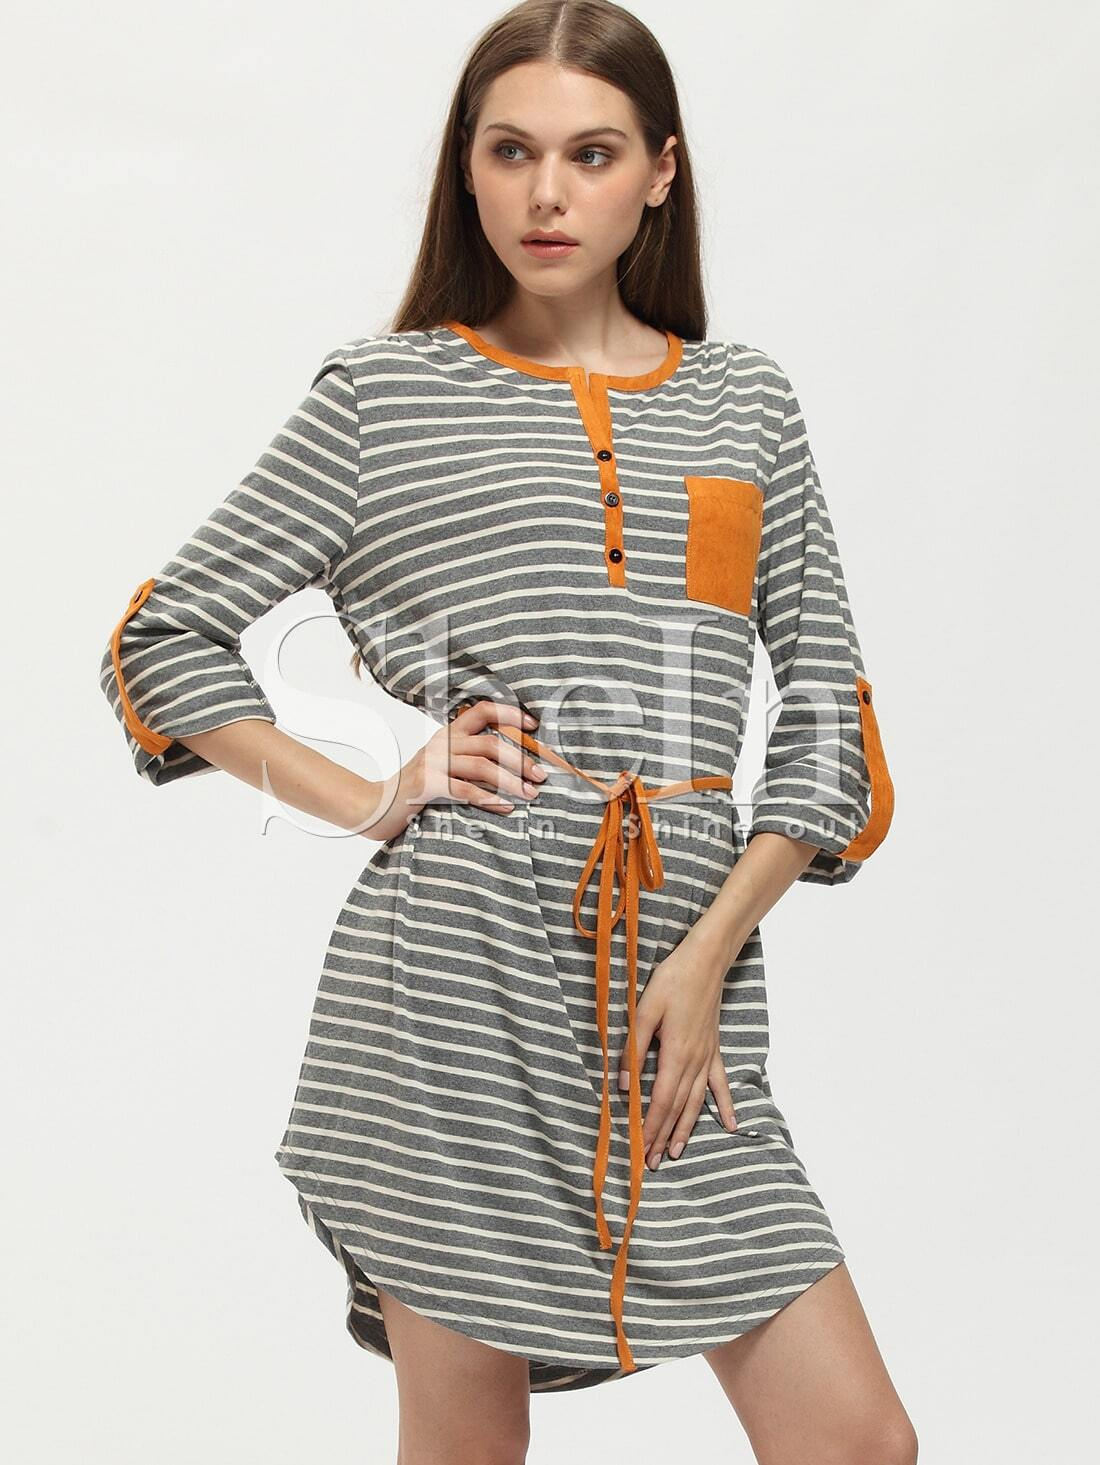 Grey Striped Color Block Trims Dress dress151229710